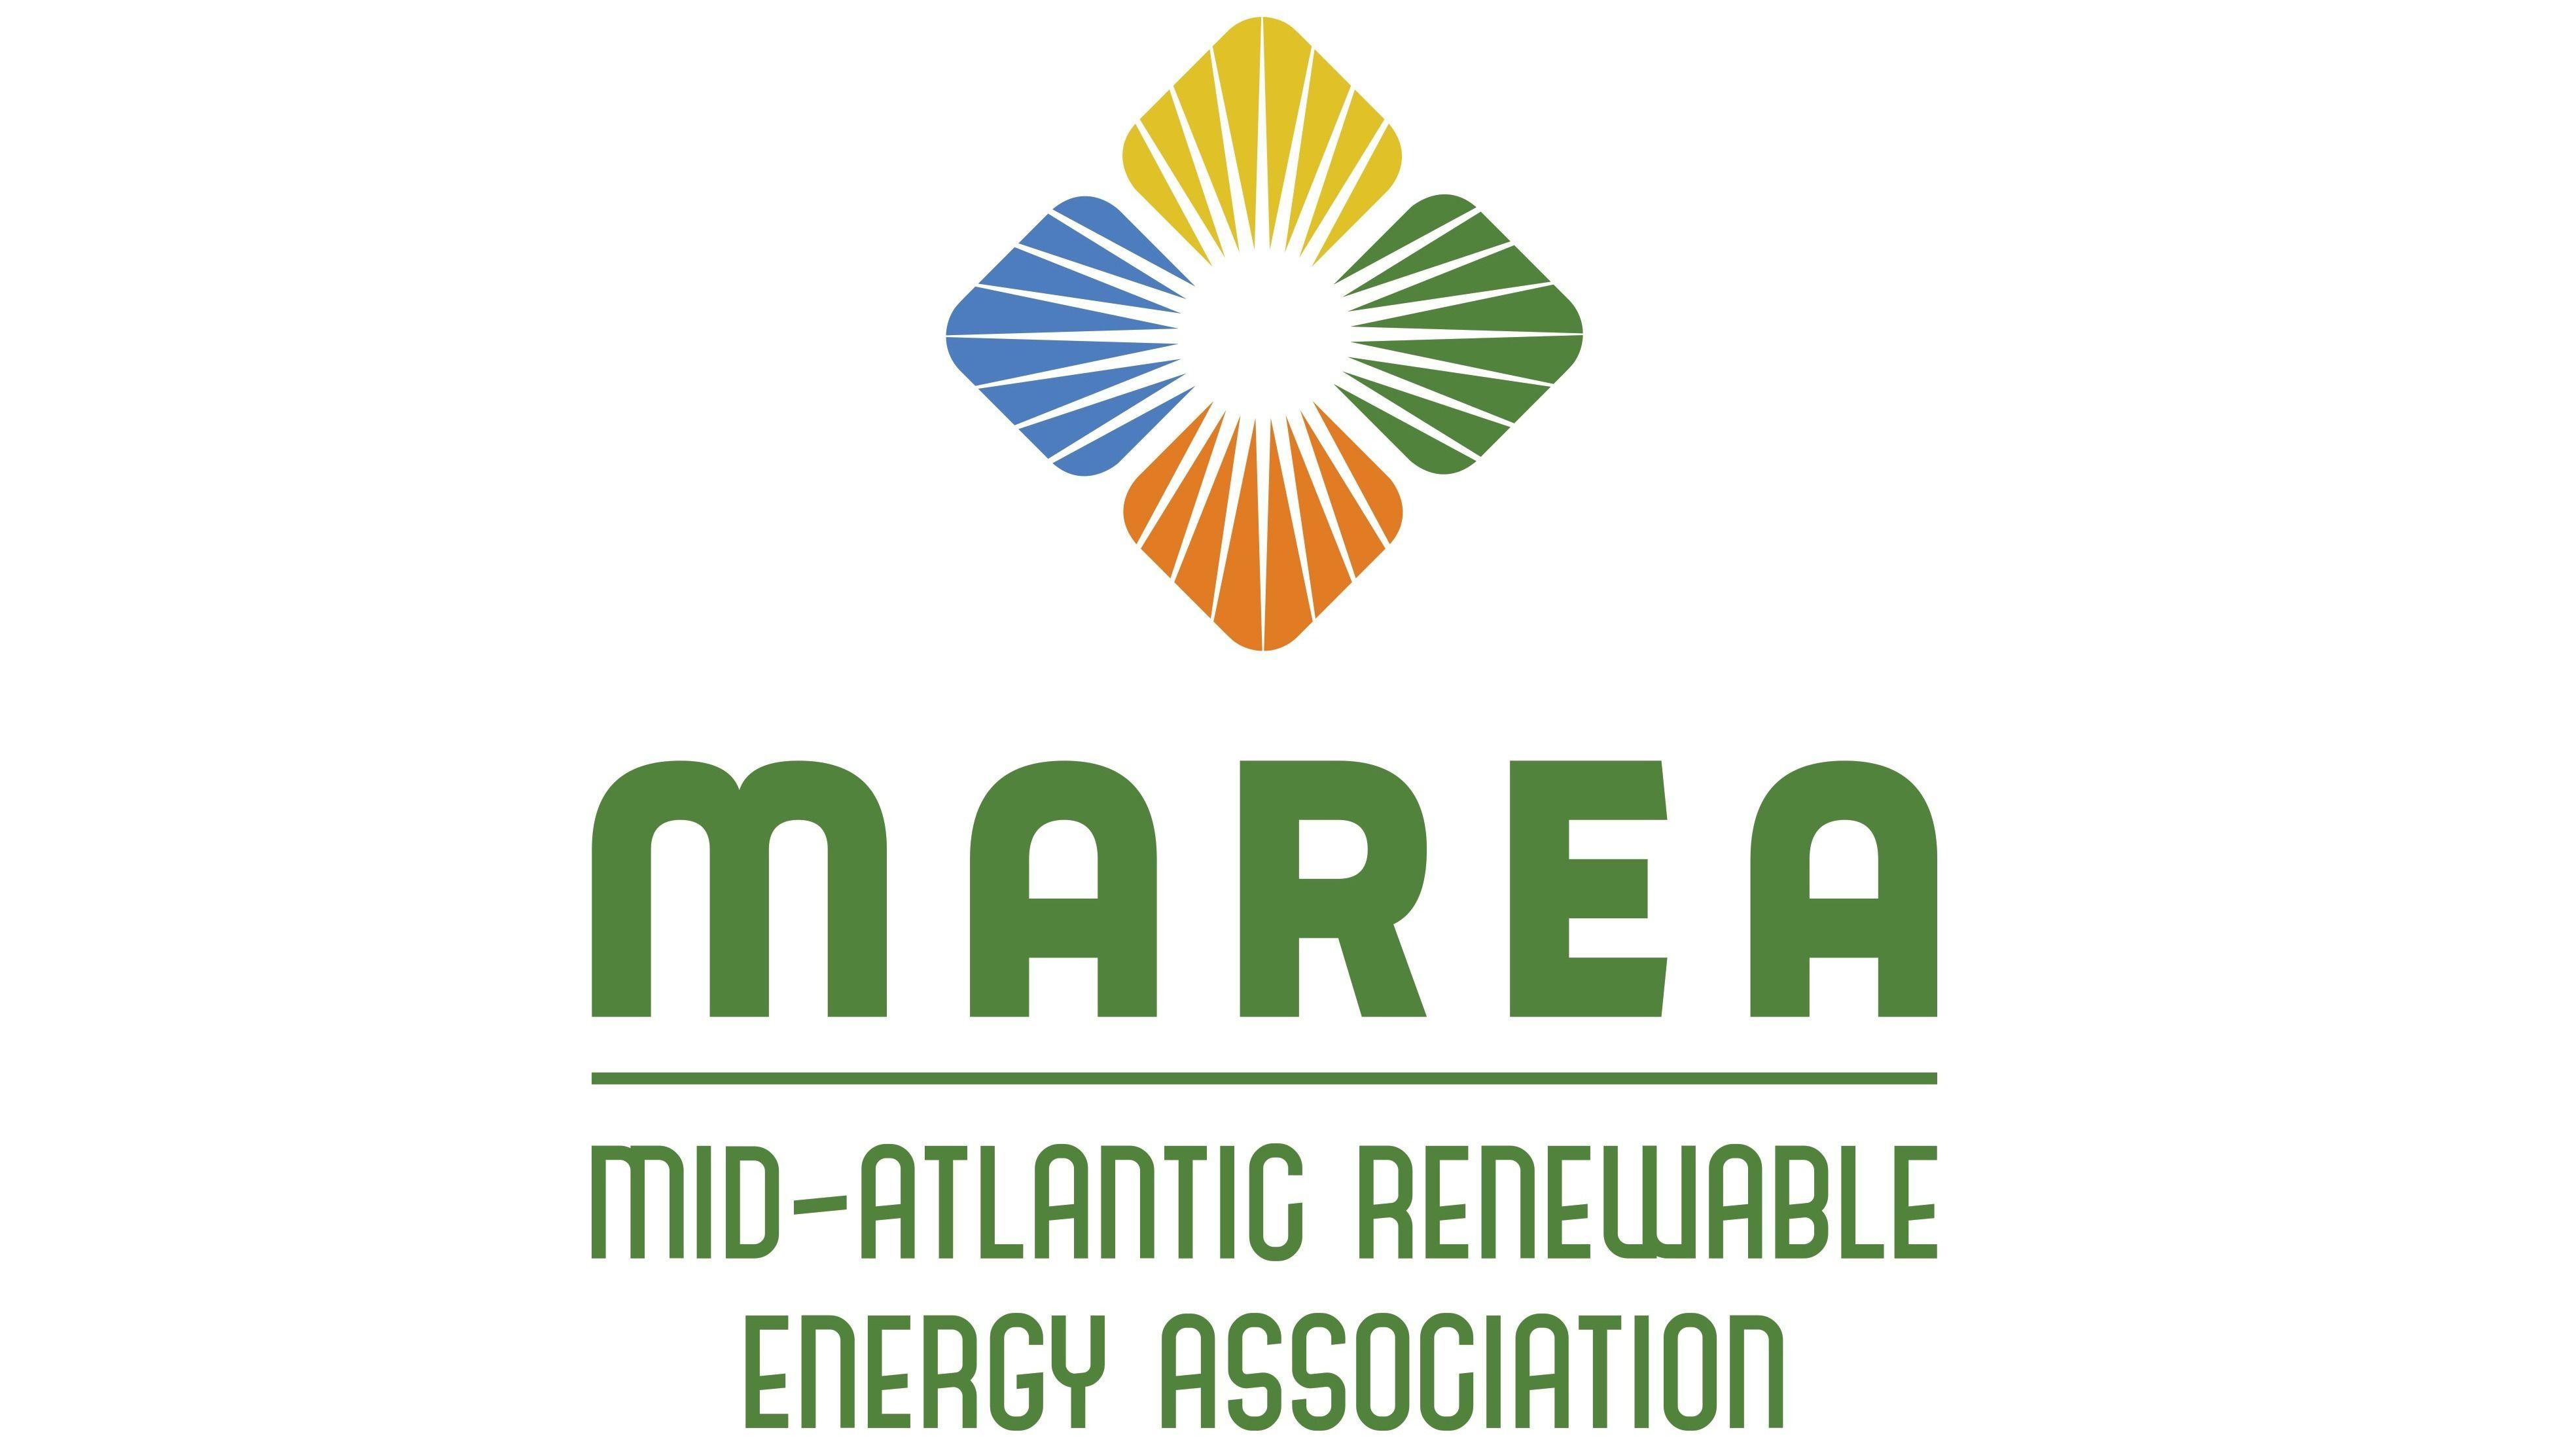 Mid-Atlantic Renewable Energy Association (eastern PA)